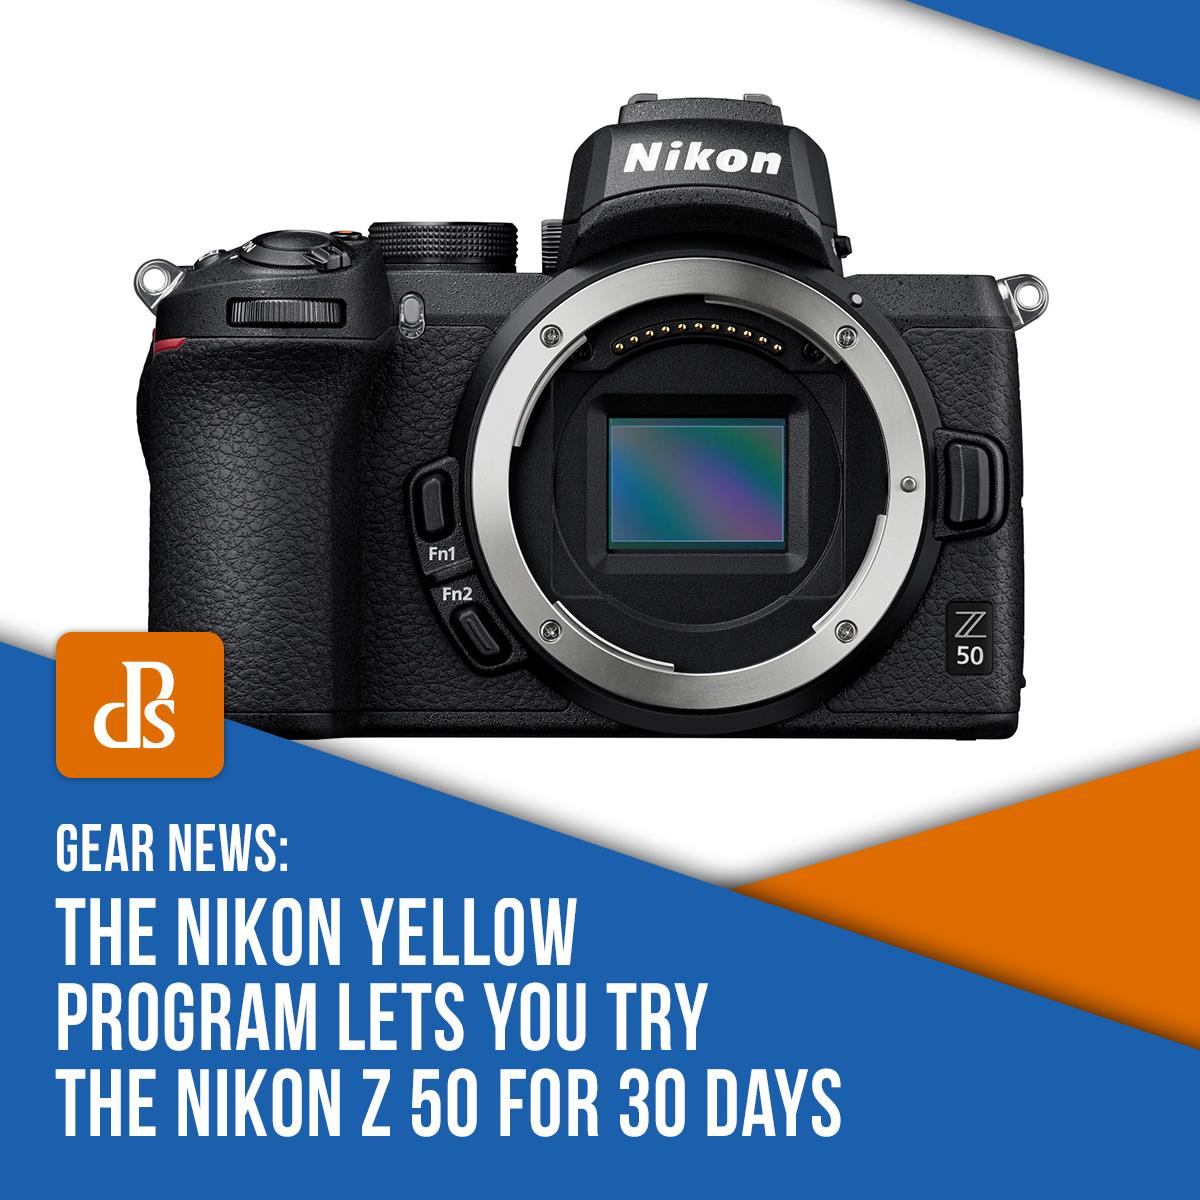 nikon-yellow-program-z-50-camera